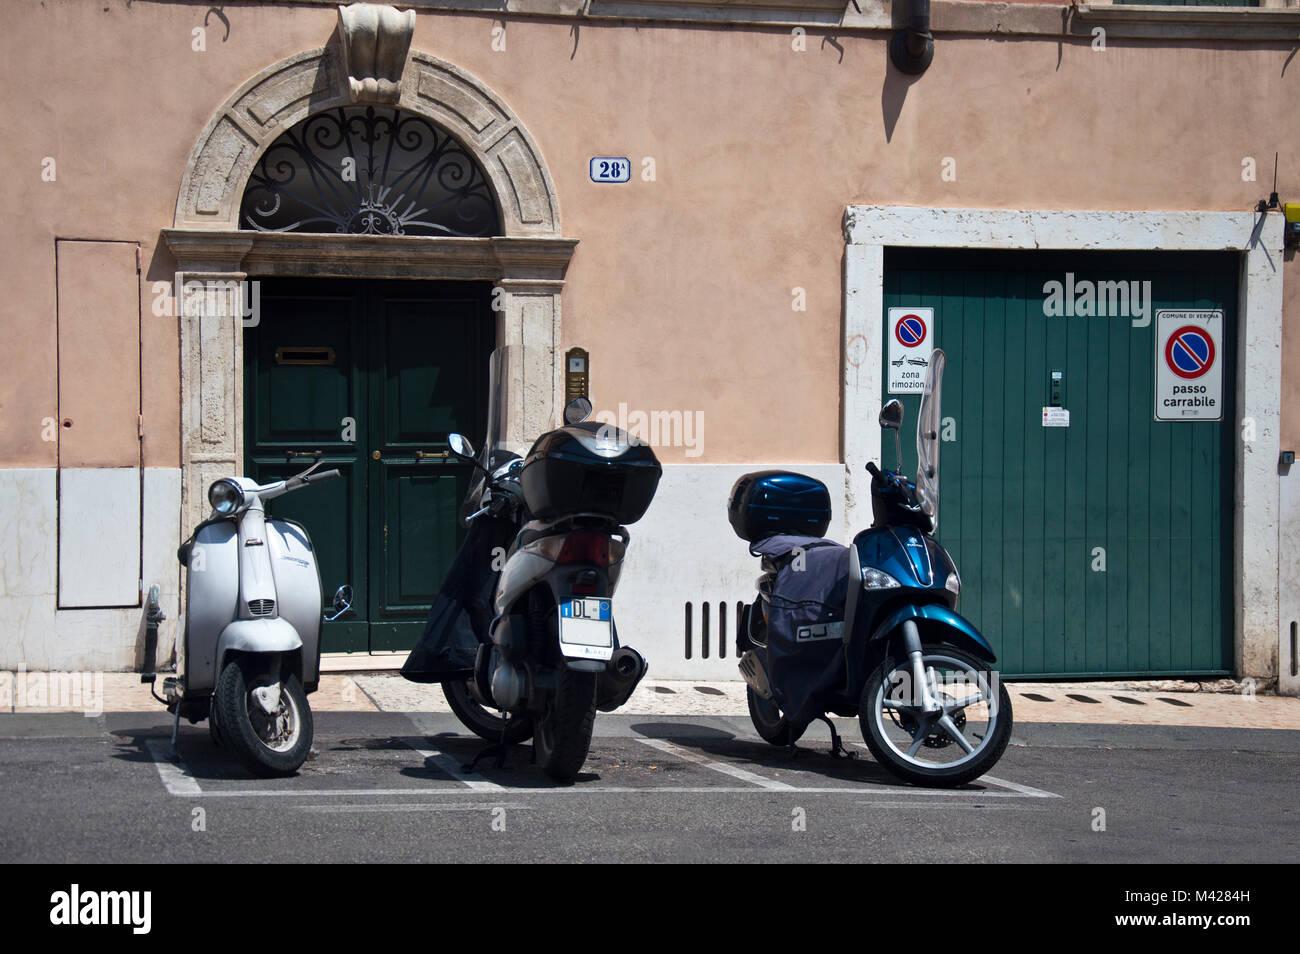 Three motor cycles parked in designated parkinig bays, Verona, Italy - Stock Image